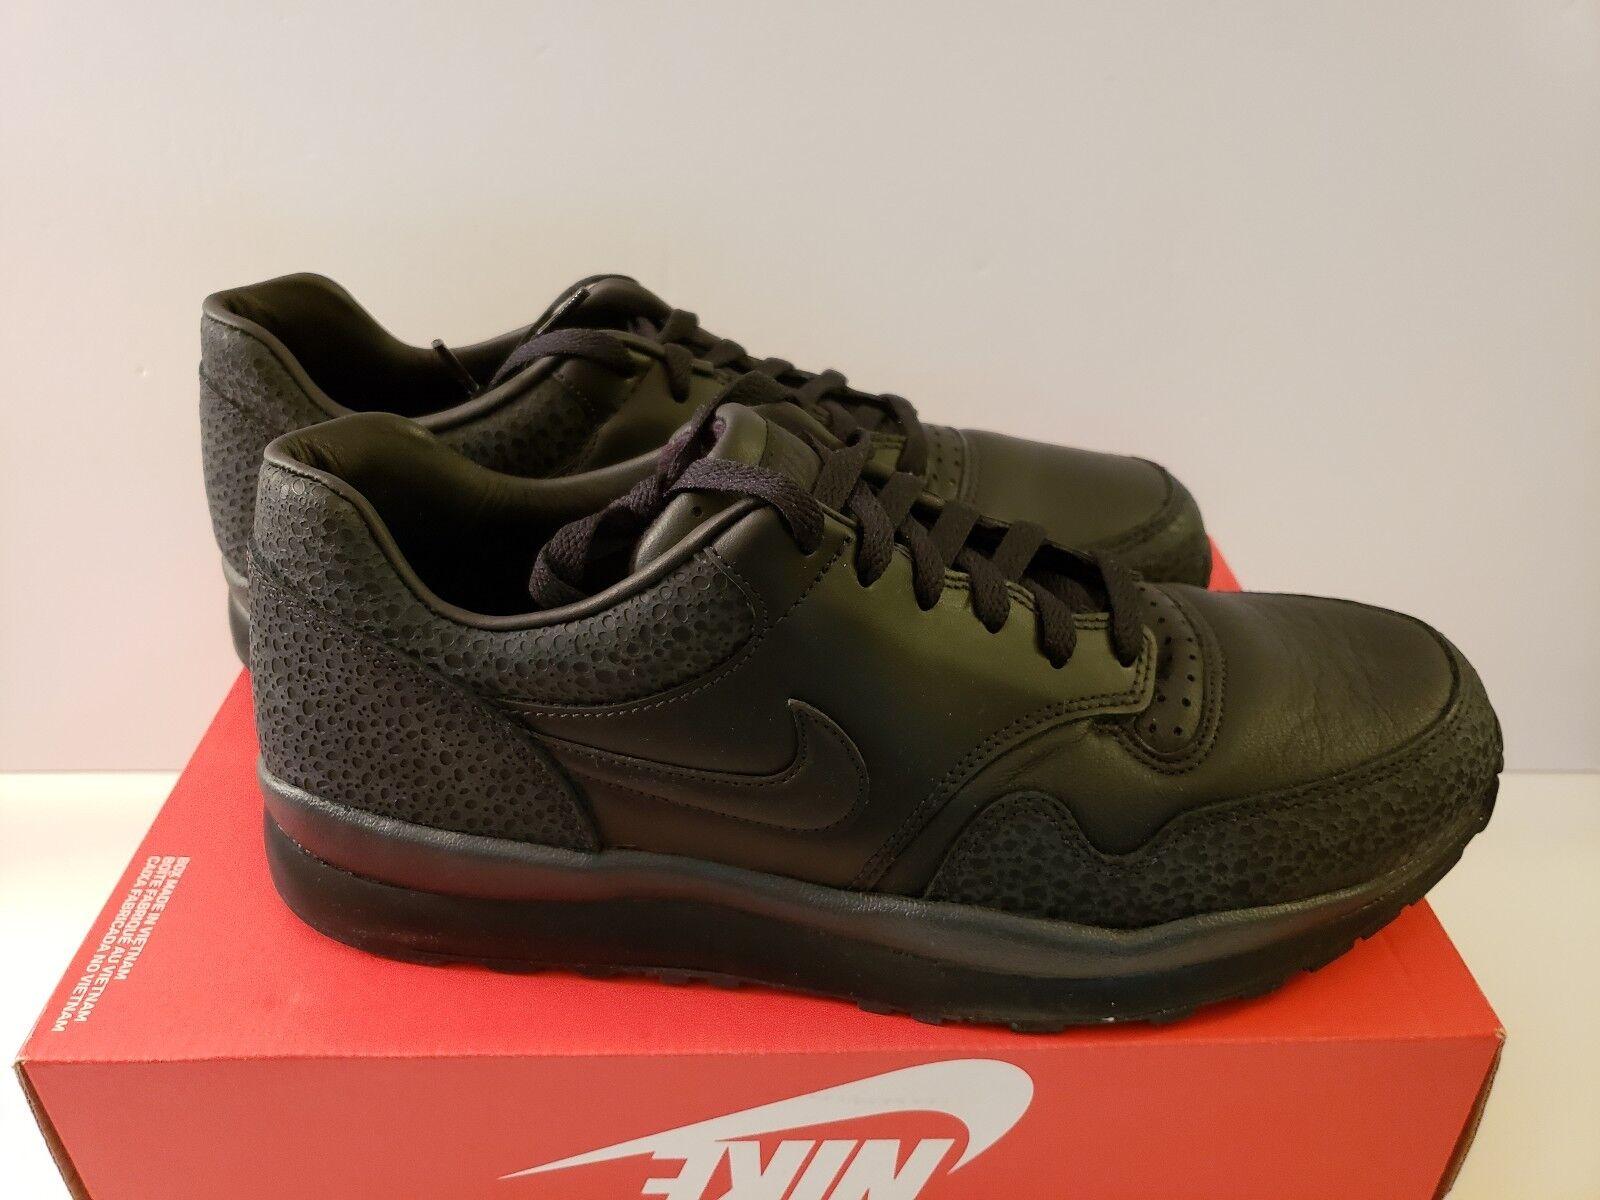 Nike Safari Air Safari Nike QS Size 12 Black Anthracite AO3295-002 Running Shoes Men's ba2466